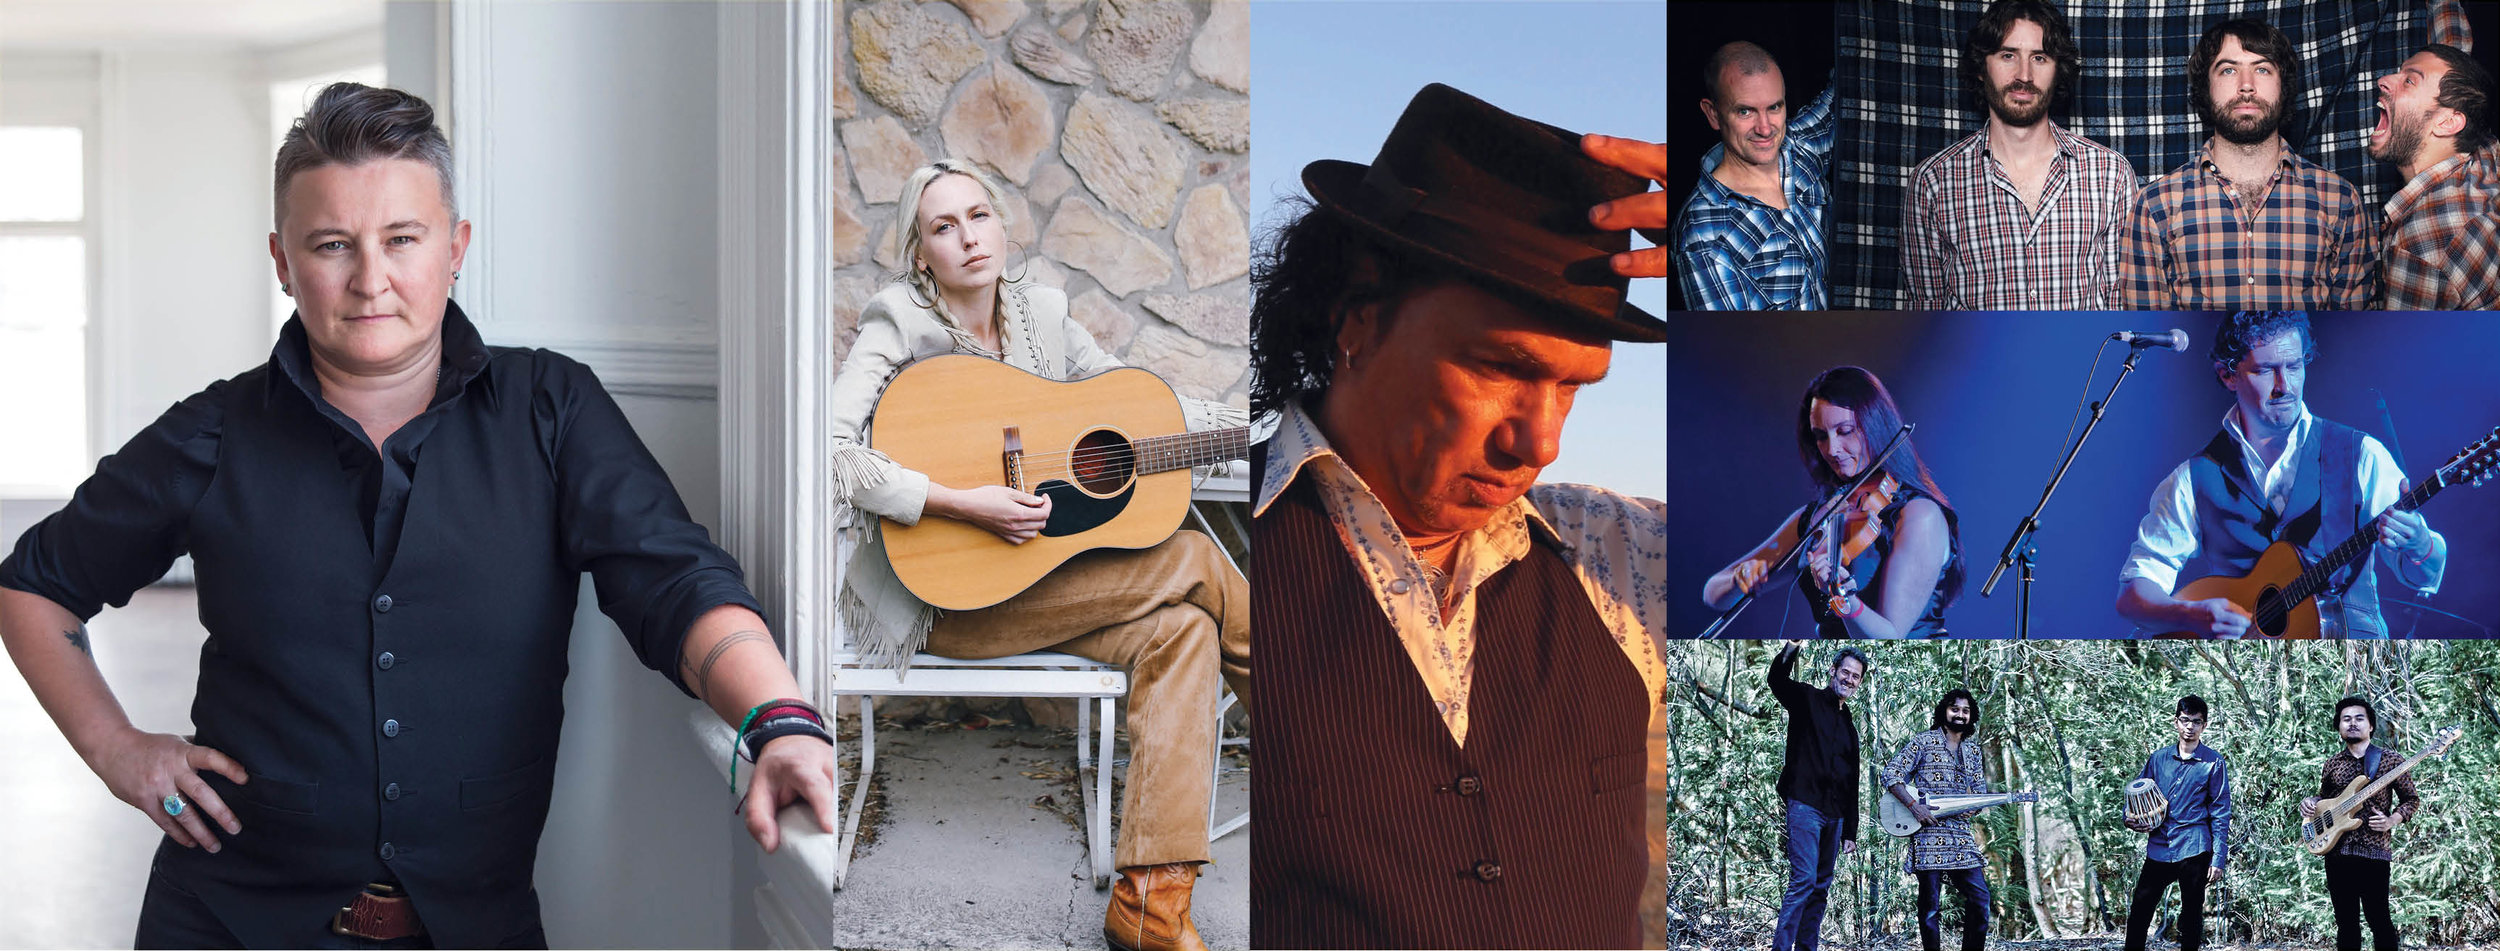 Performing at 2019 National Folk Festival (L-R): Irish Mythen, Freya Hollick, Glen Skuthorpe, Green Mohair Suits, Nancy Kerr & James Fagan, Praashekh Quartet.